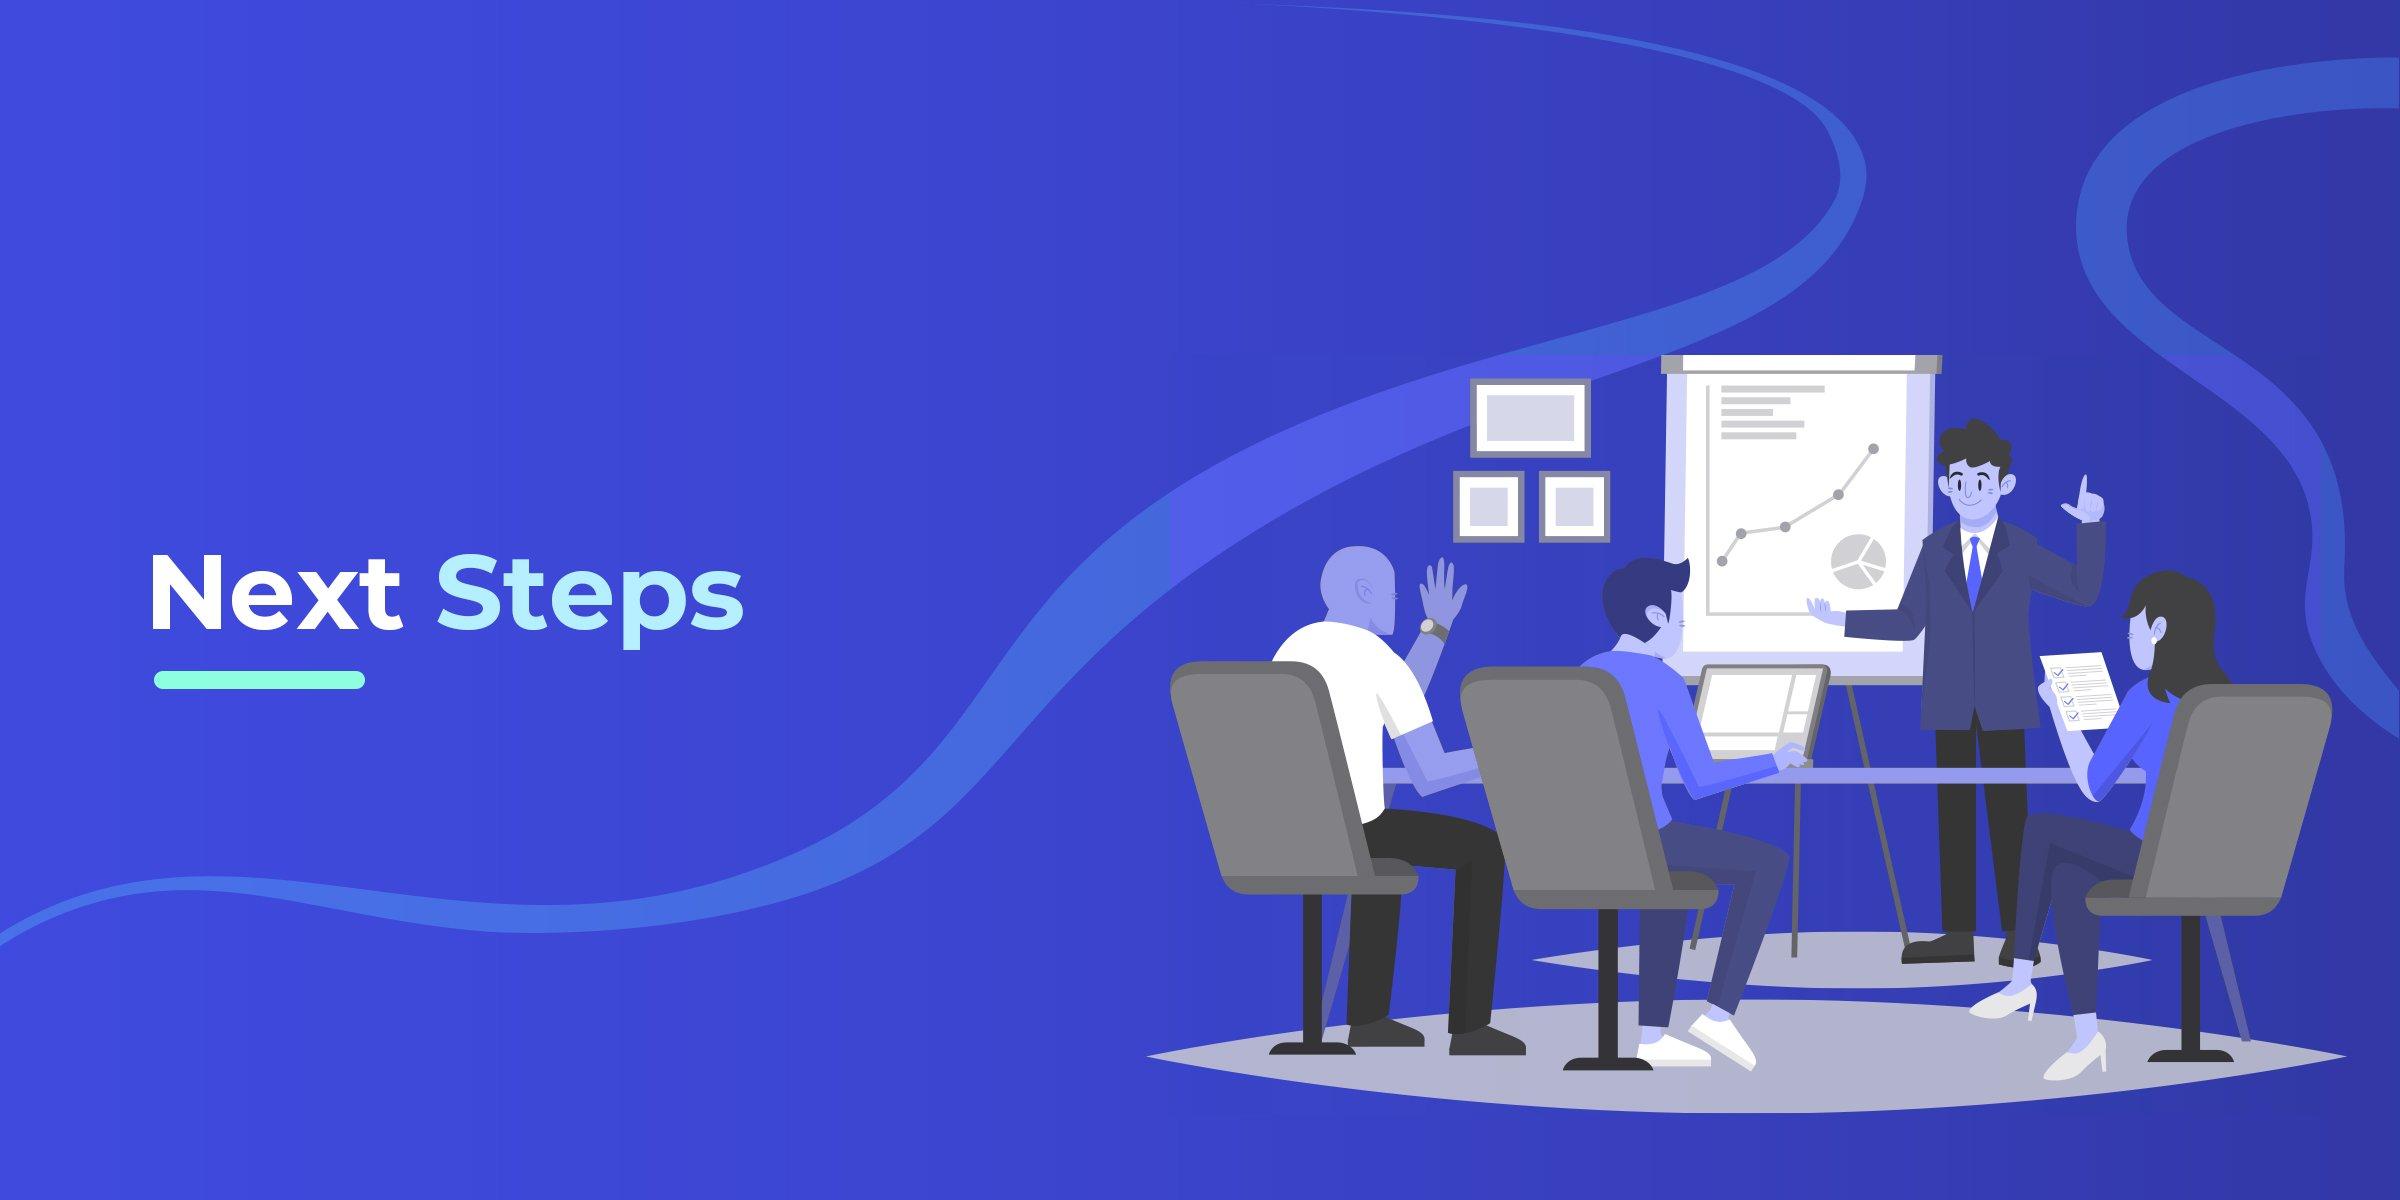 Elements of a Proposal - Next Steps